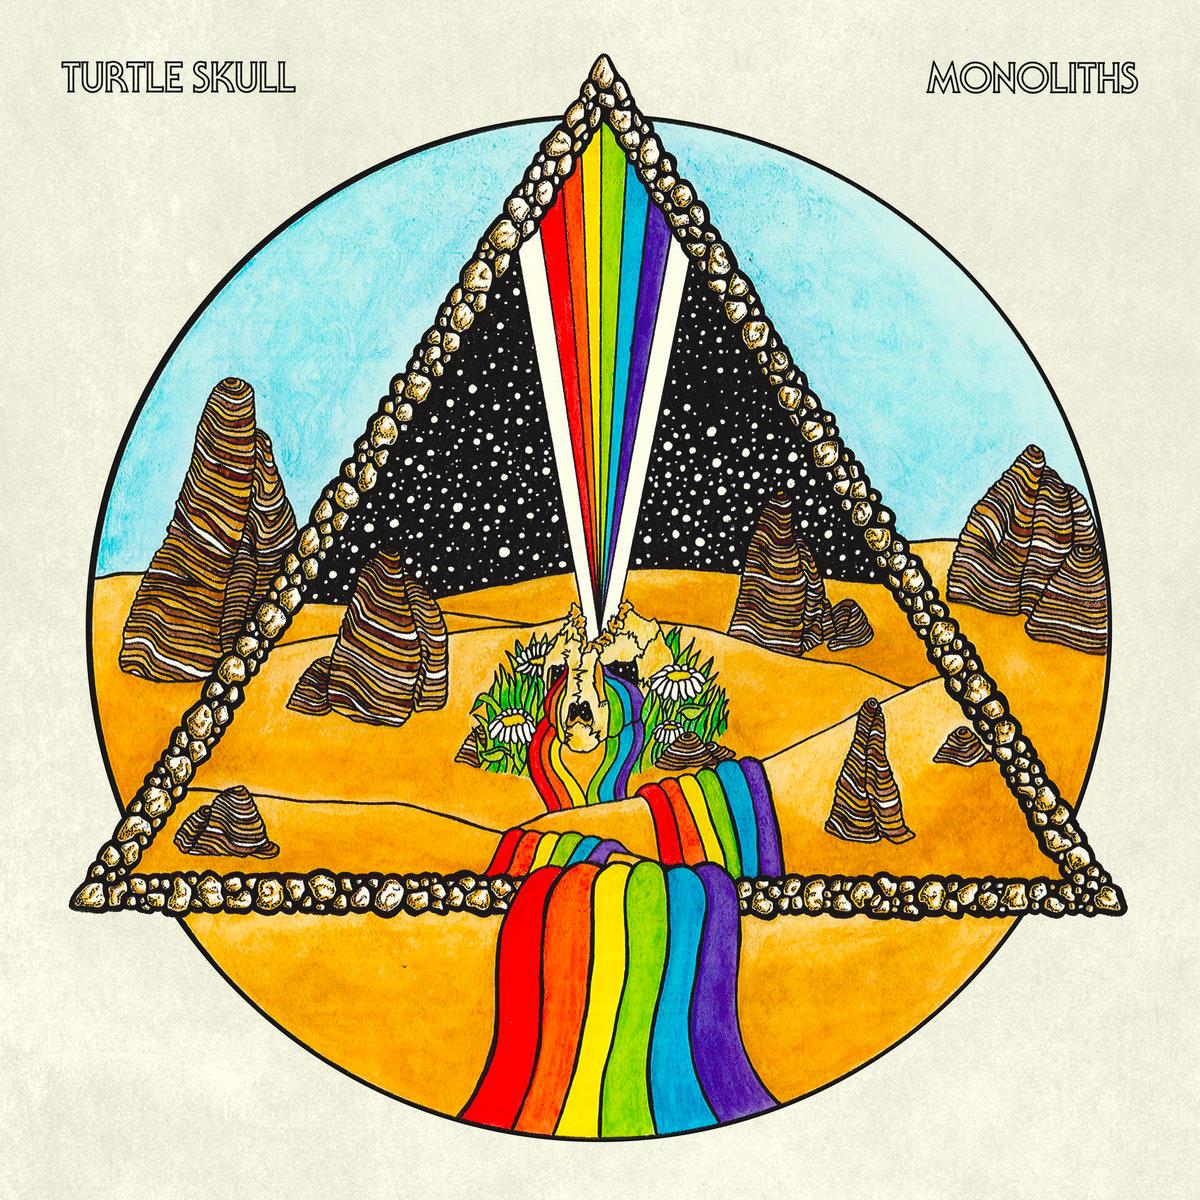 Turtle Skull new album Monoliths